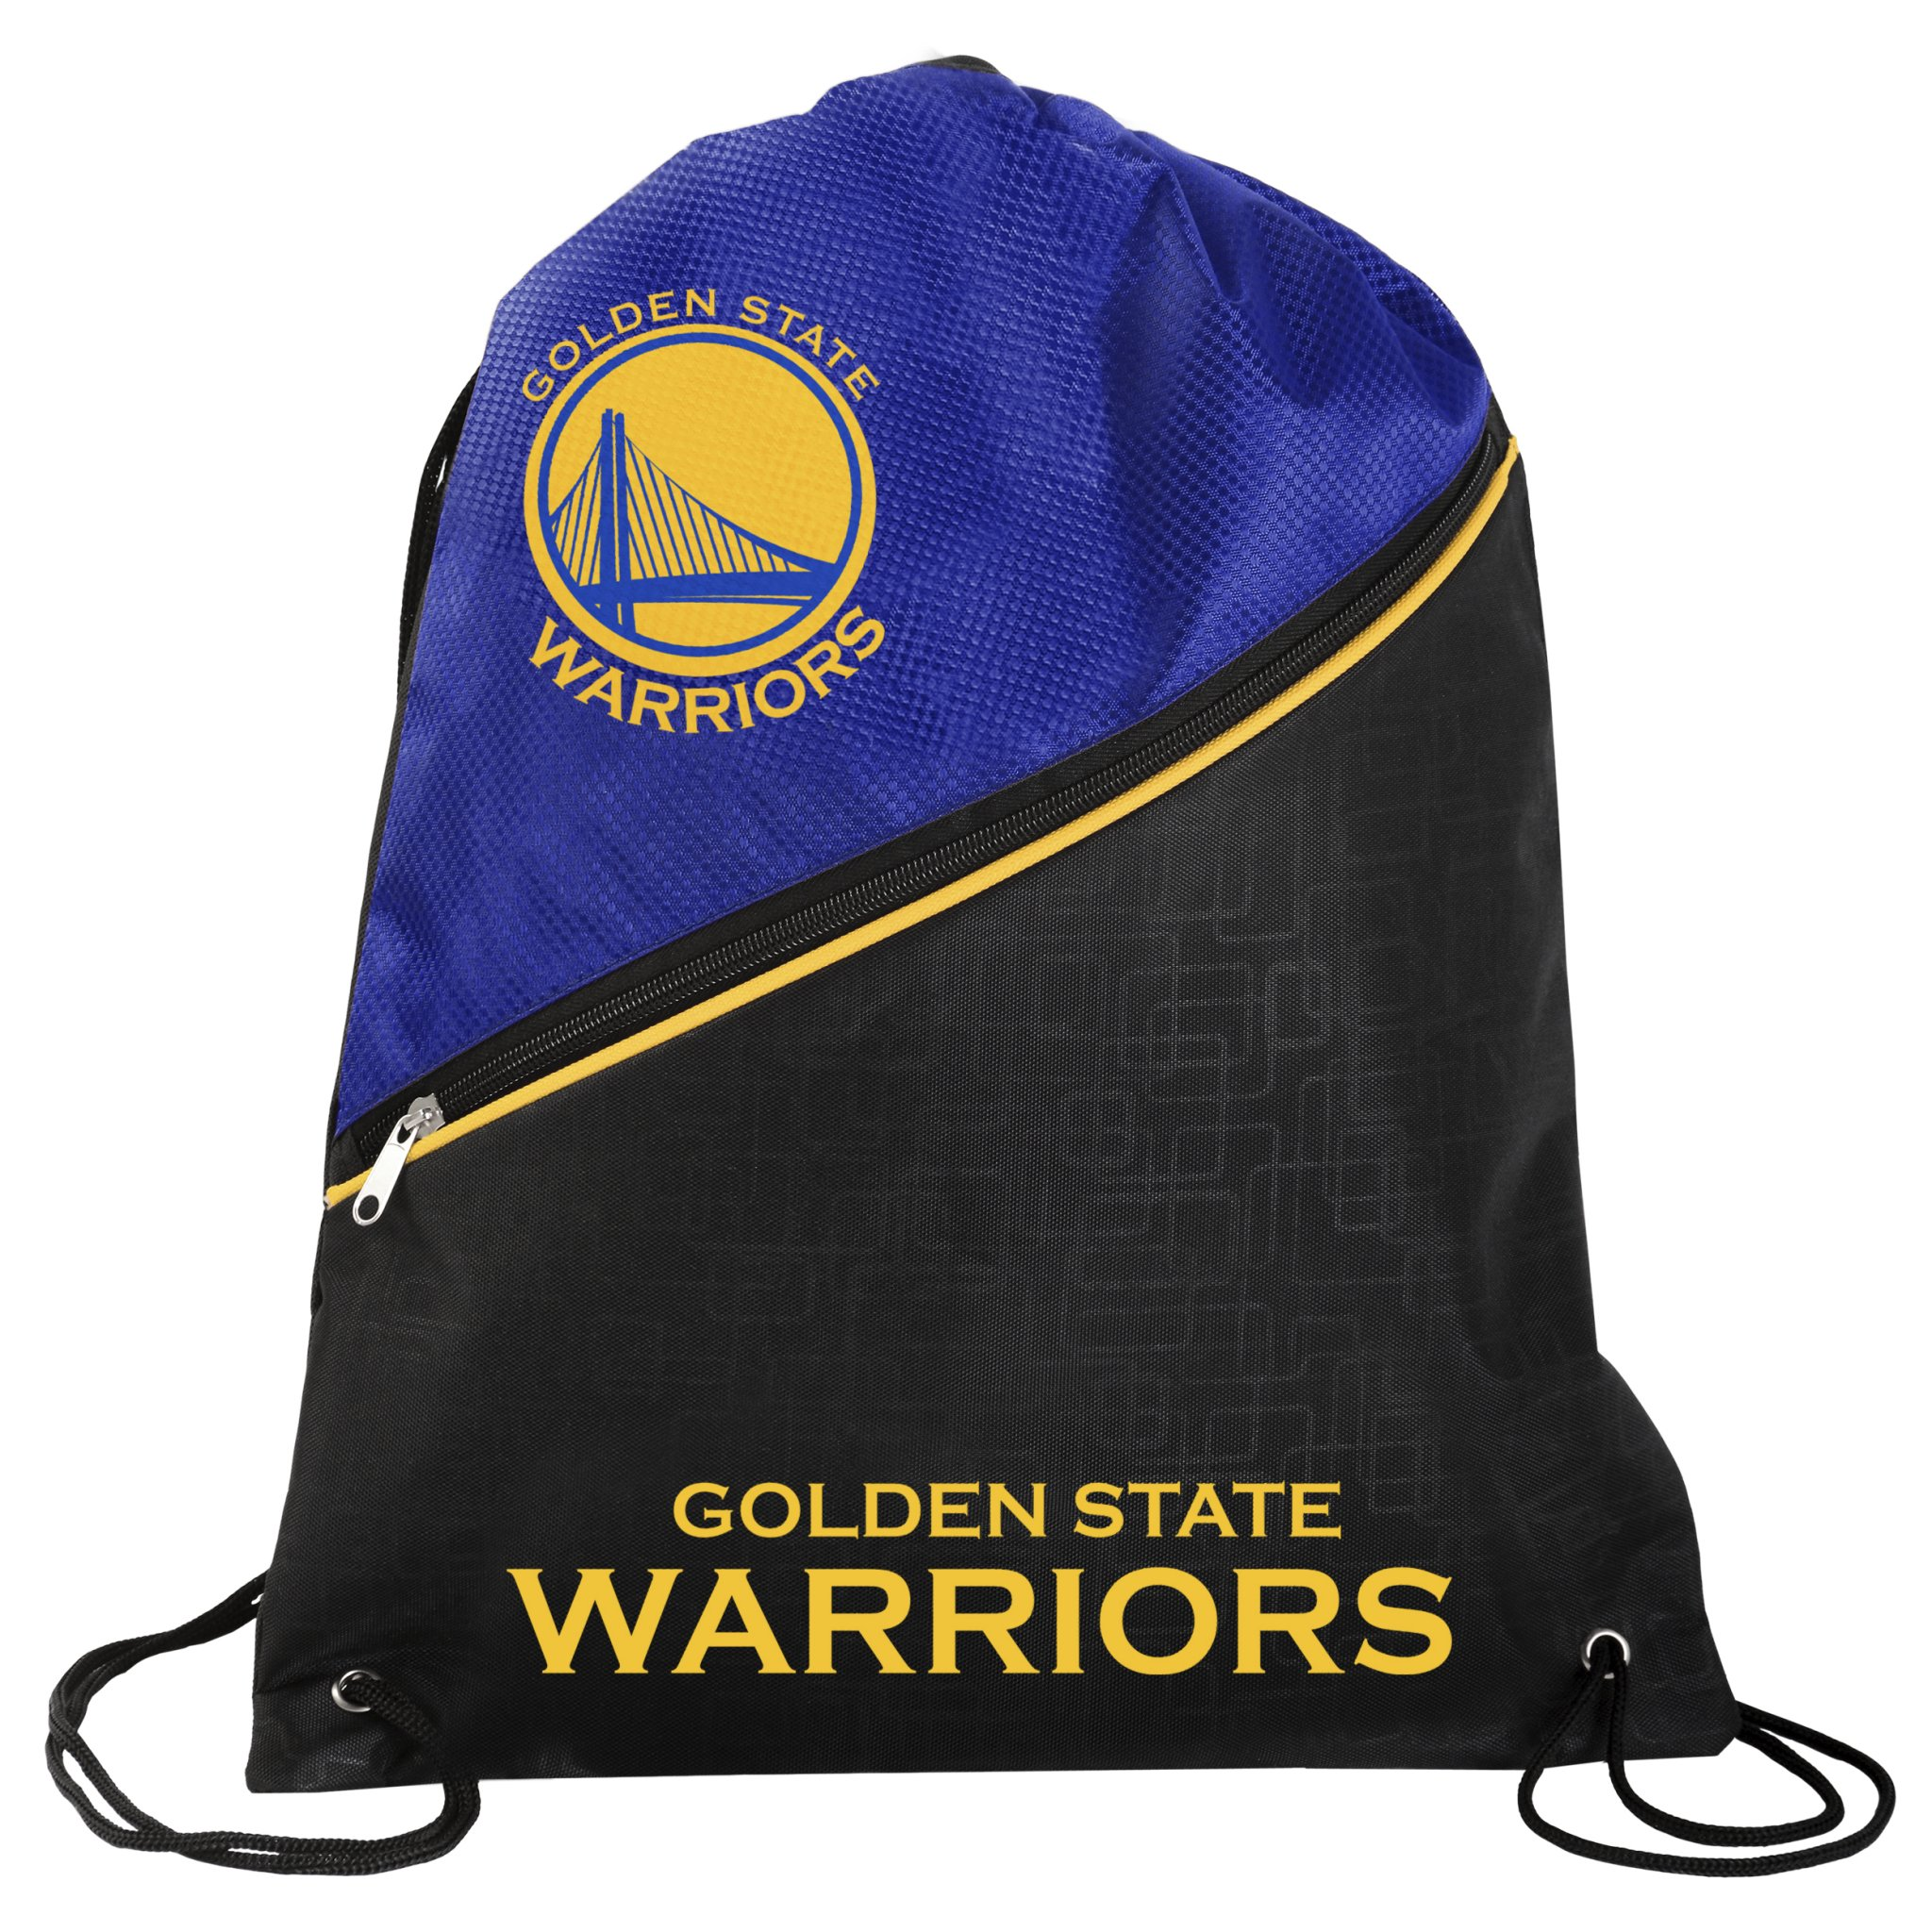 FOCO Golden State Warriors Official NBA High End Diagonal Zipper Drawstring Backpack Gym Bag